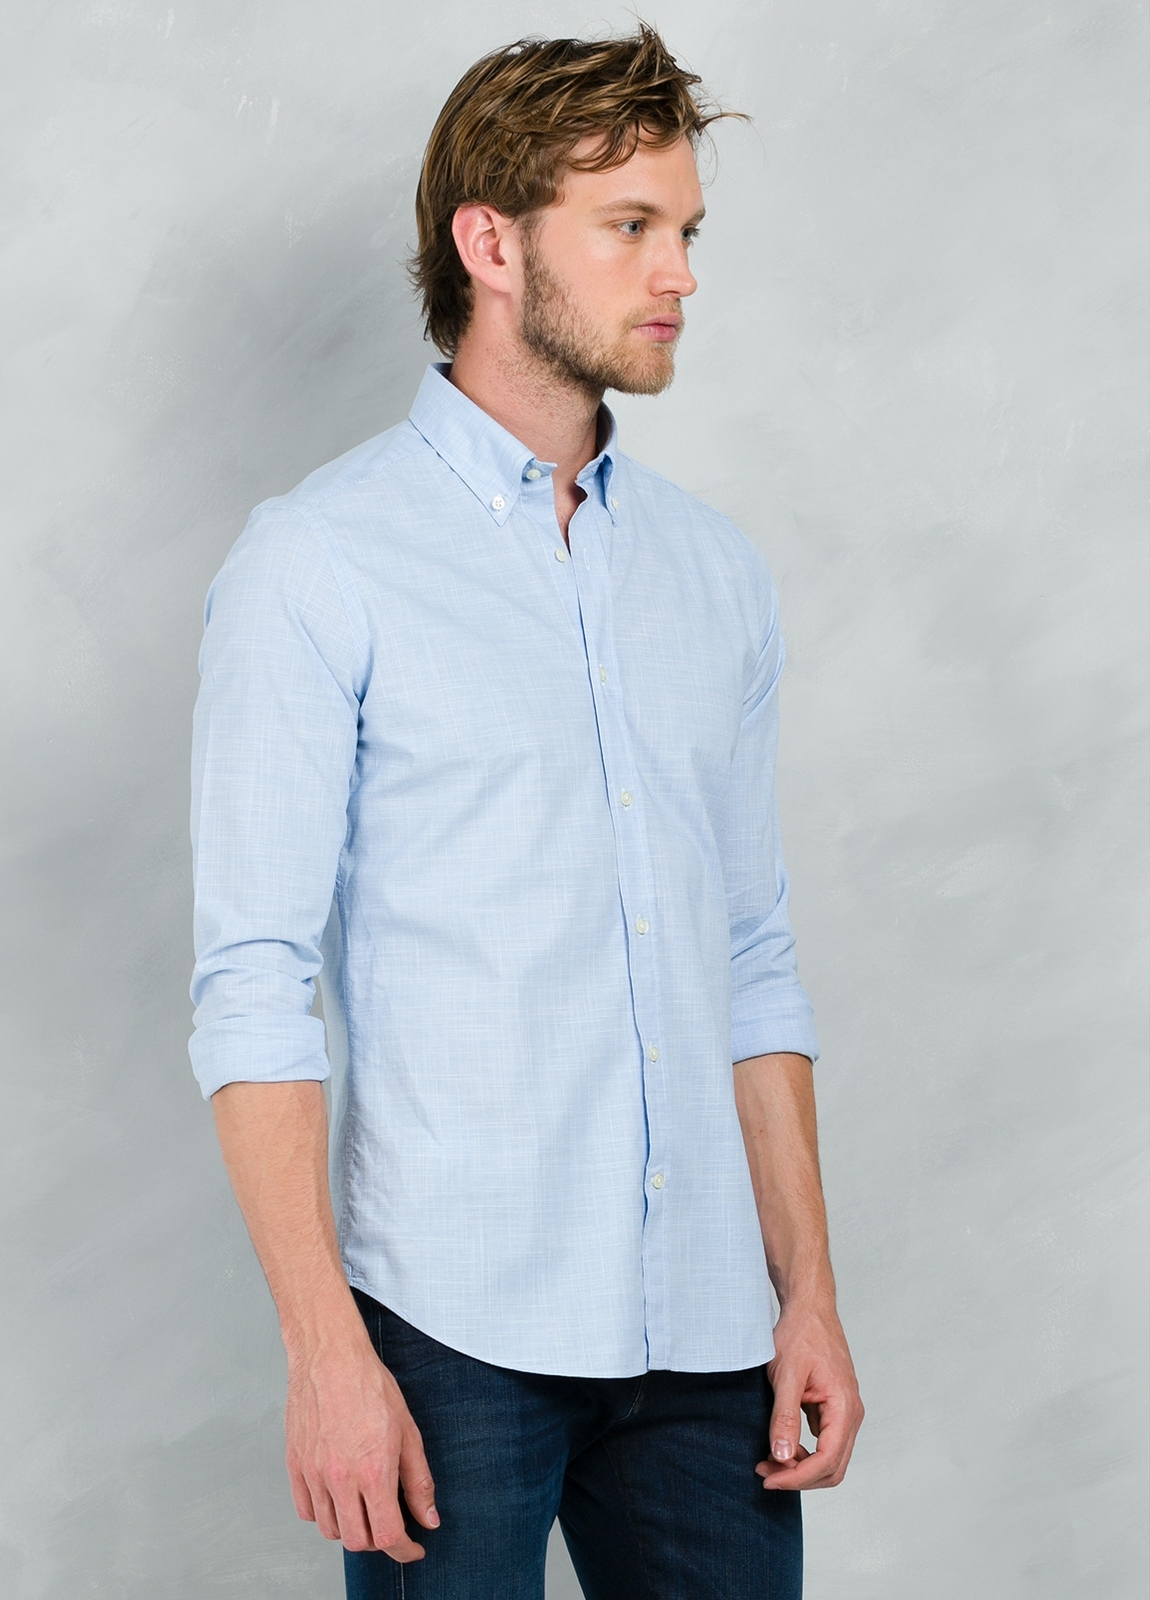 Camisa Casual Wear SLIM FIT Modelo BUTTON DOWN dibujo pata de gallo color celeste, 100% Algodón. - Ítem1